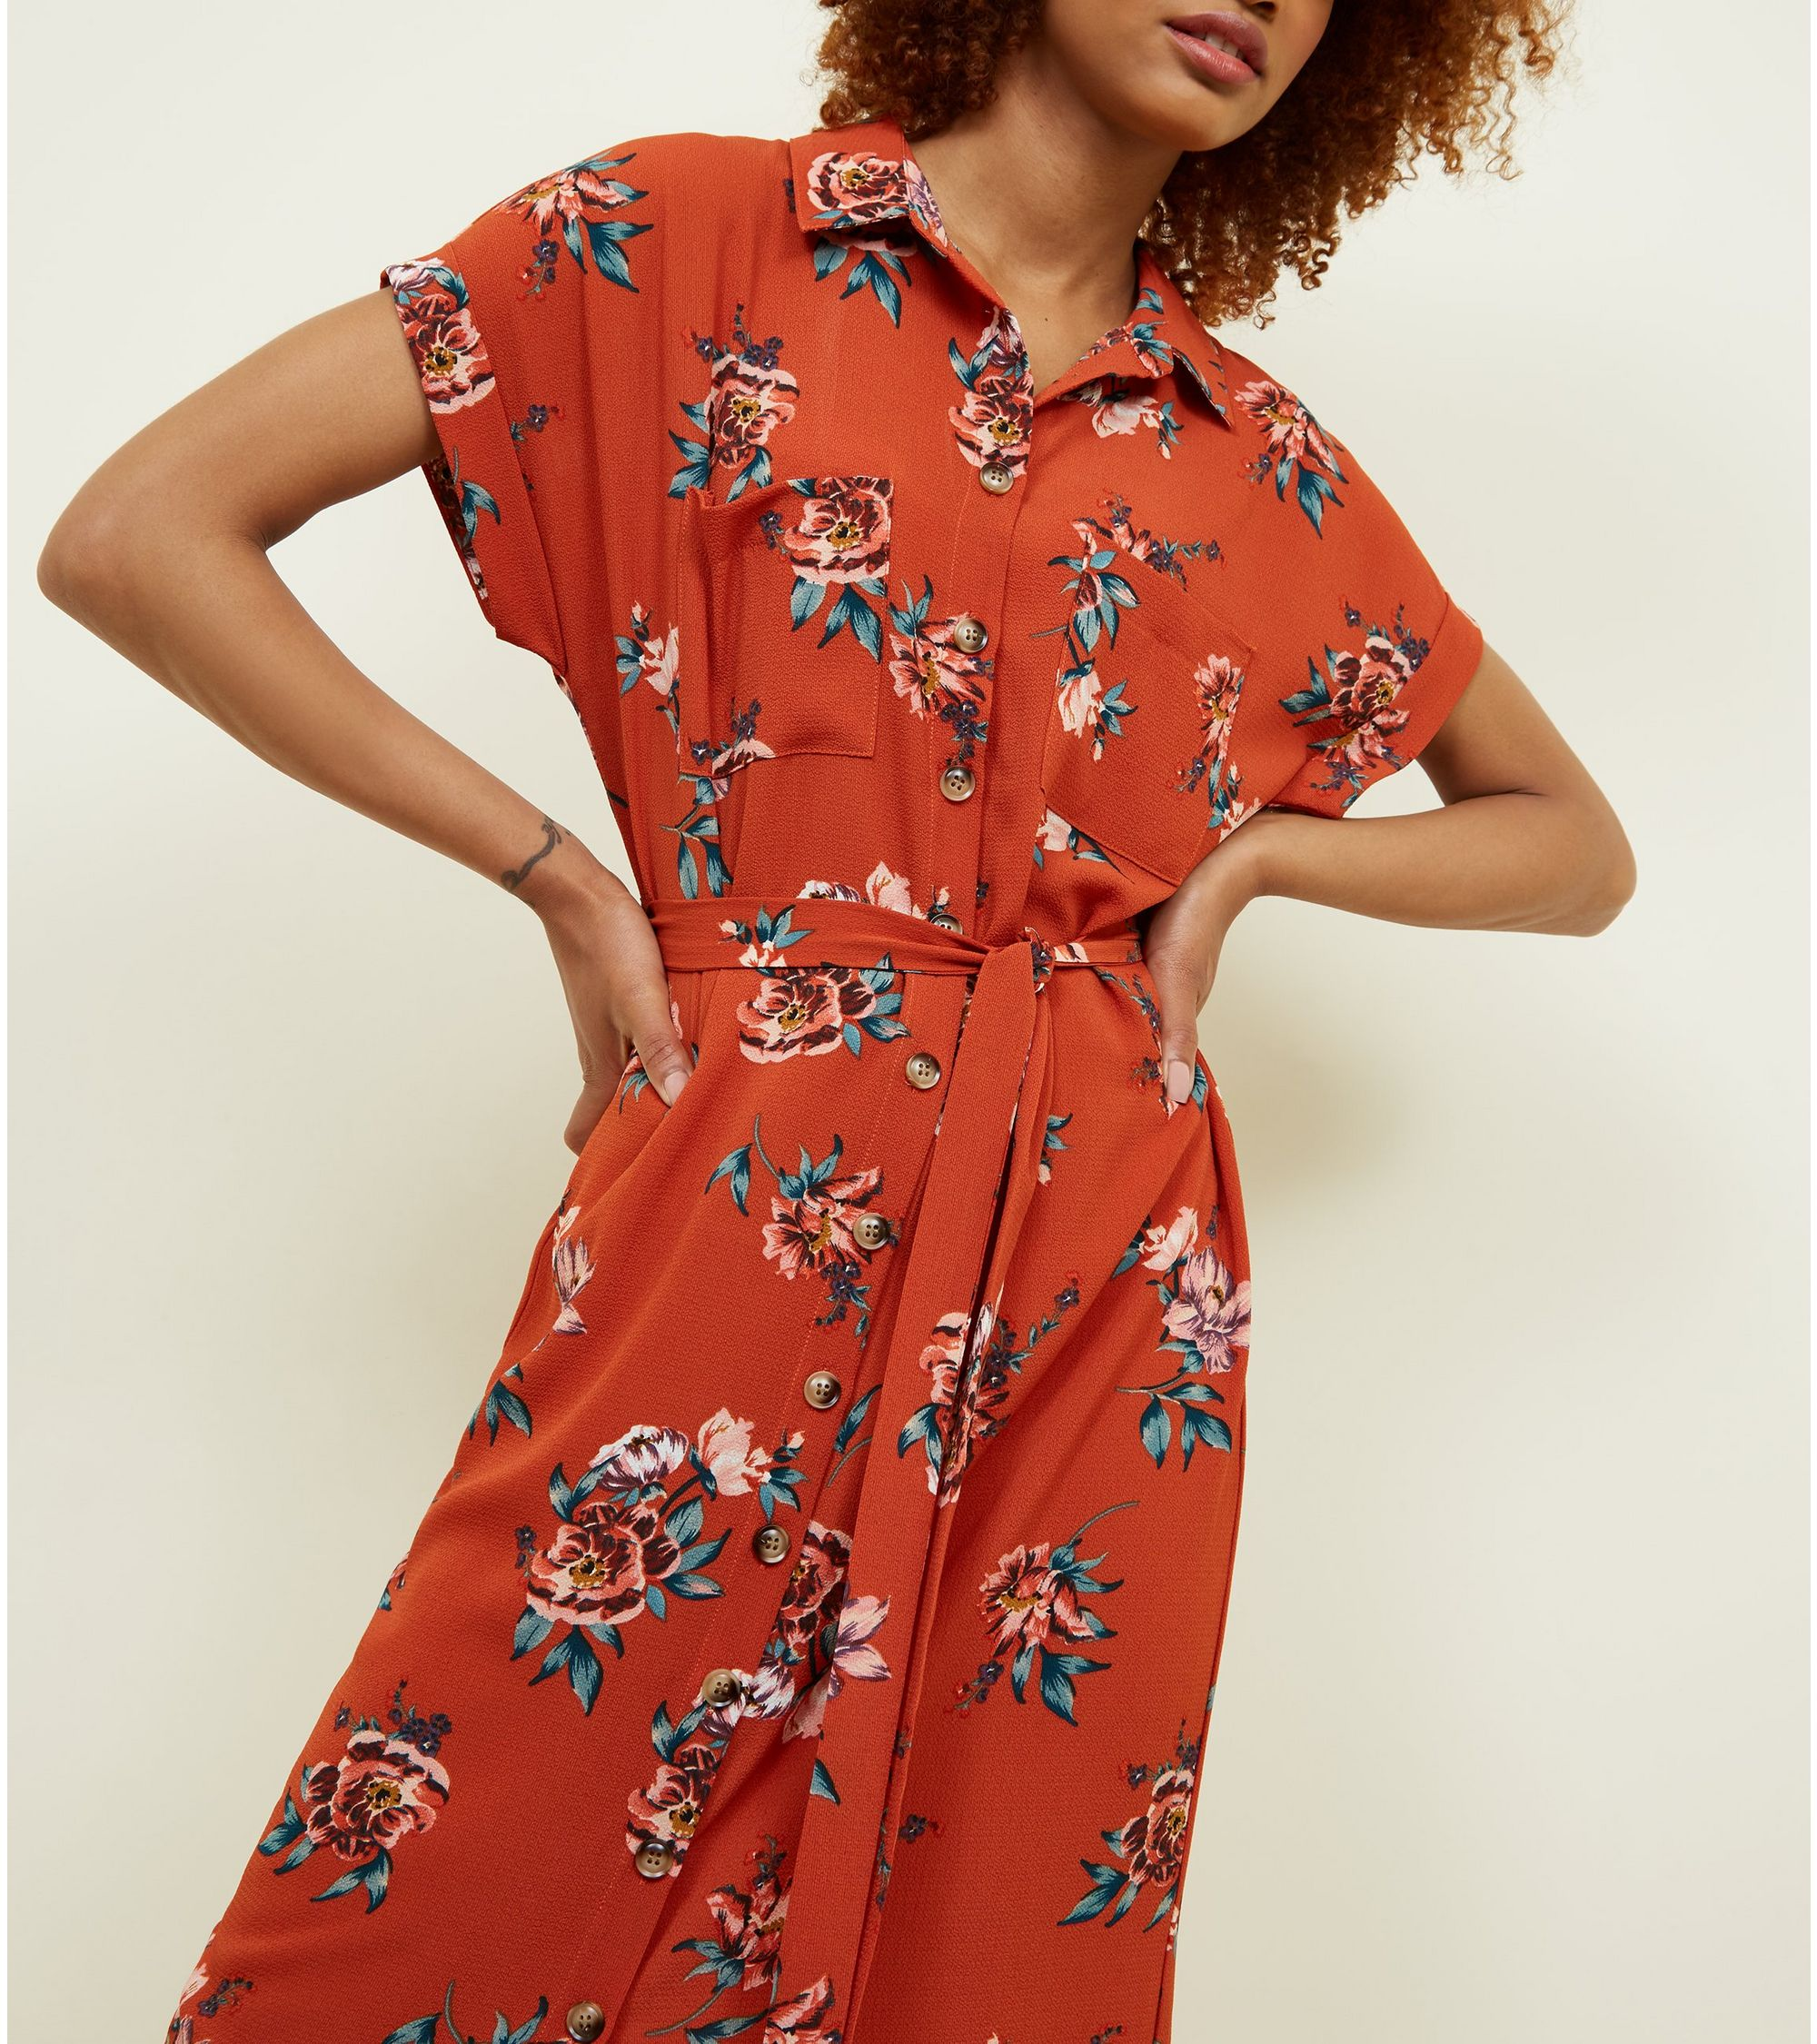 85d5085048f New Look Floral Dress Orange